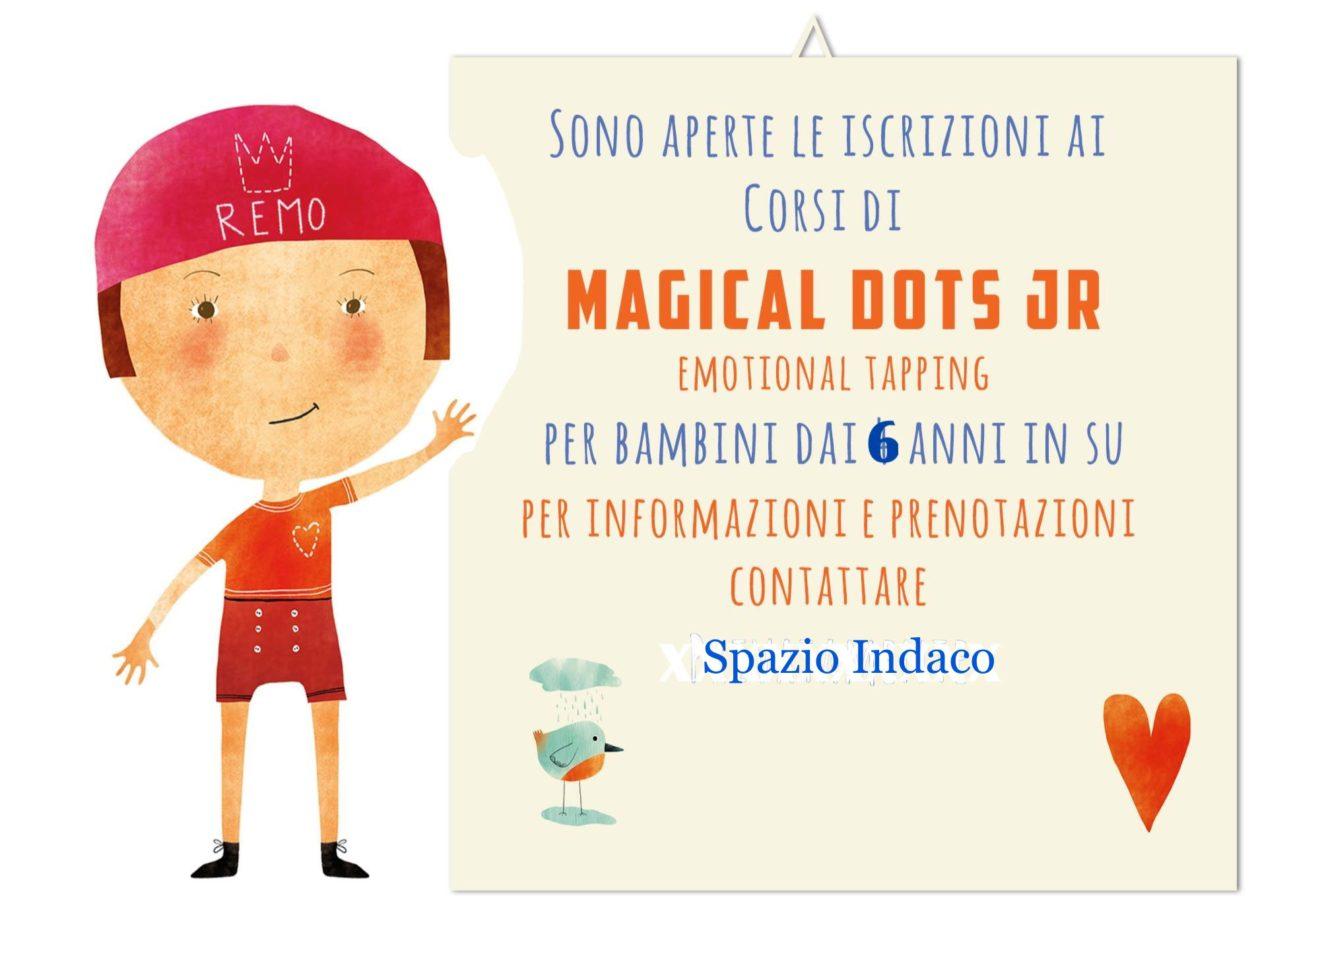 Magical Dots Jr - Emotional Tapping per Bambini